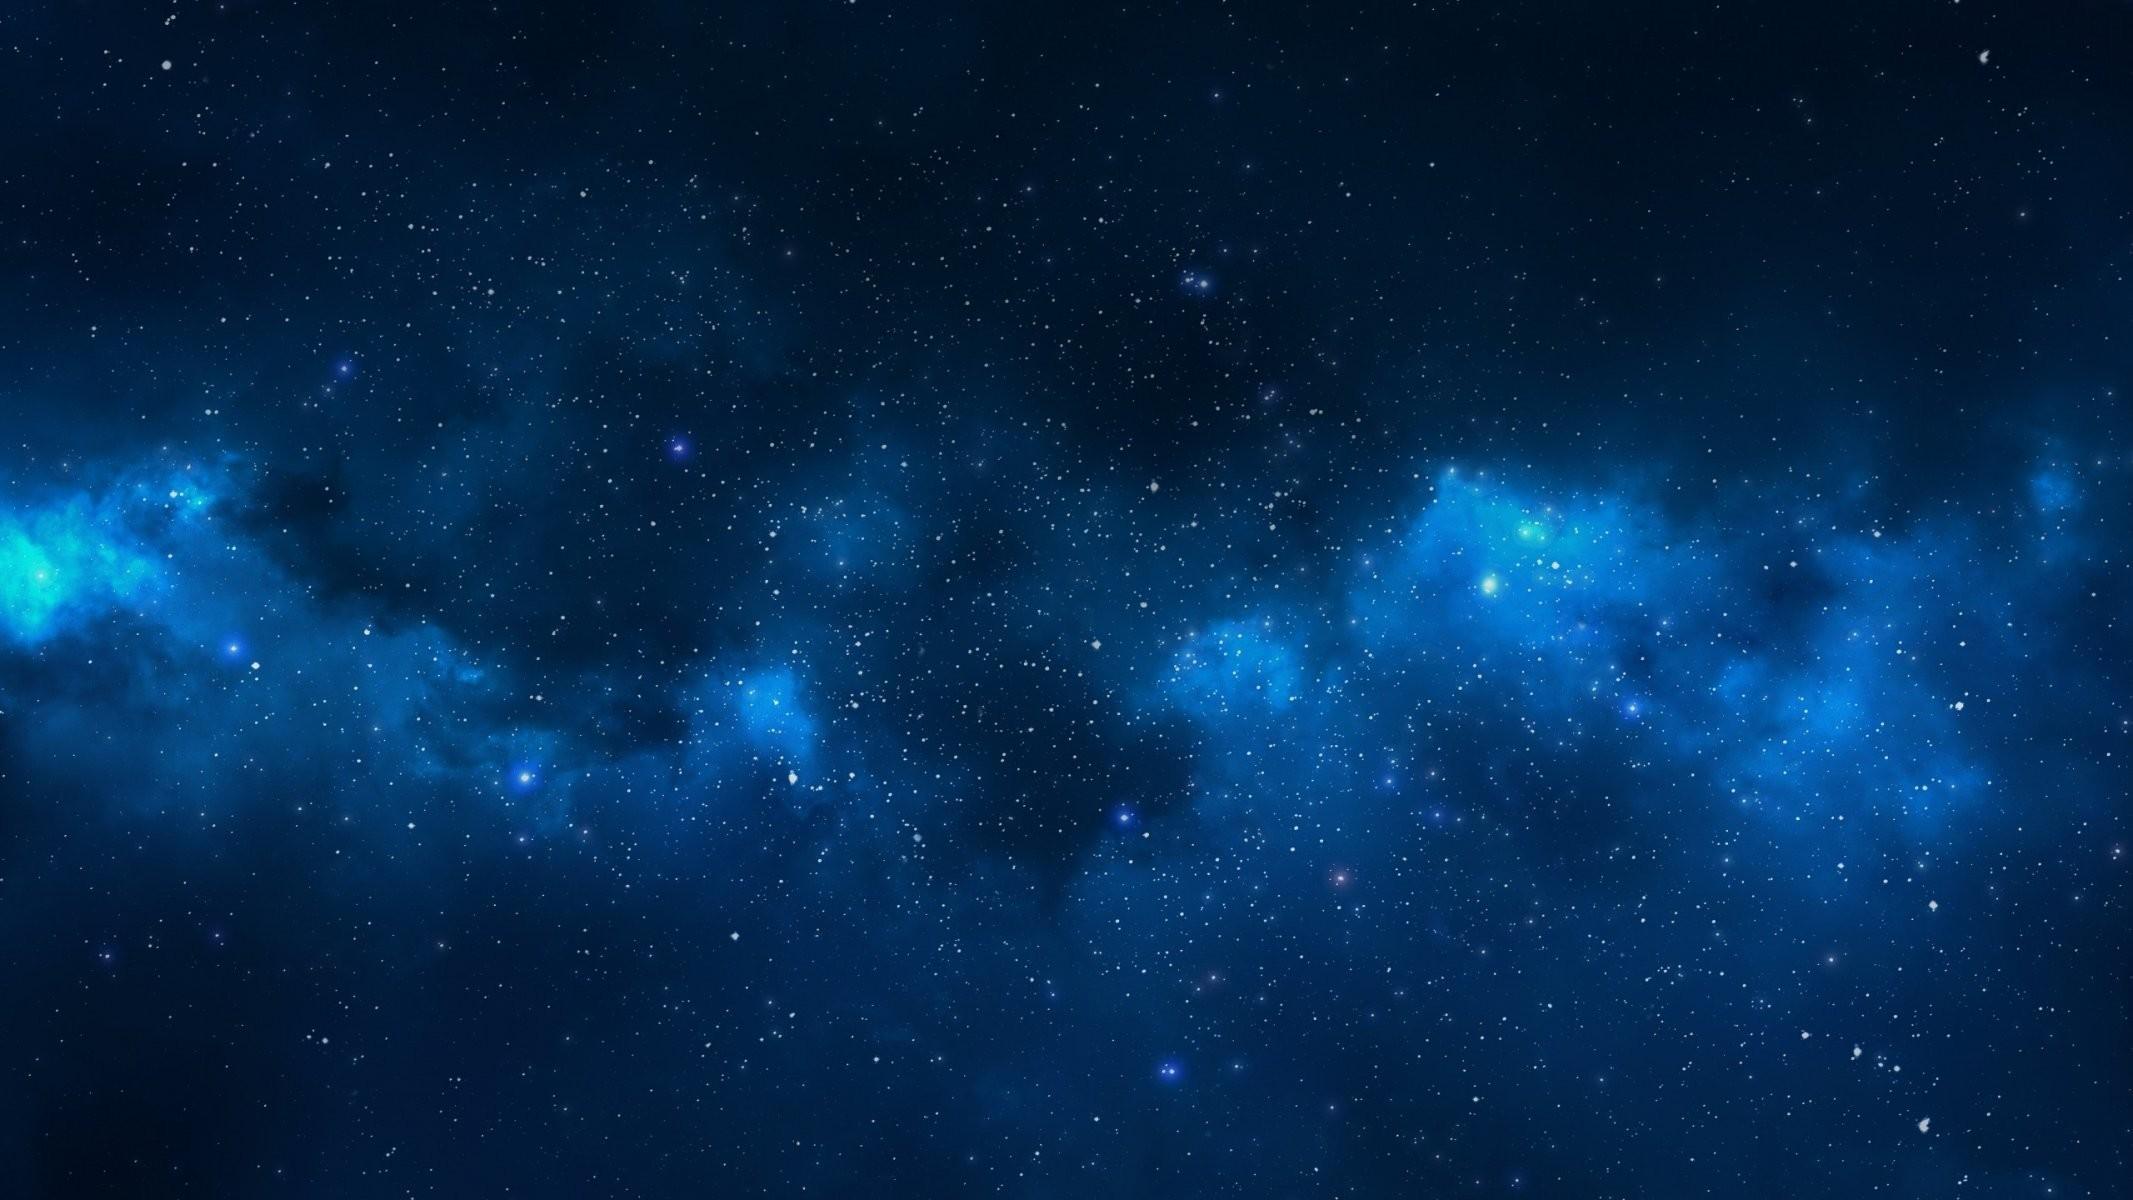 … wallpaper wallpapersafari; landscape star sky night night sky stars  star night background …